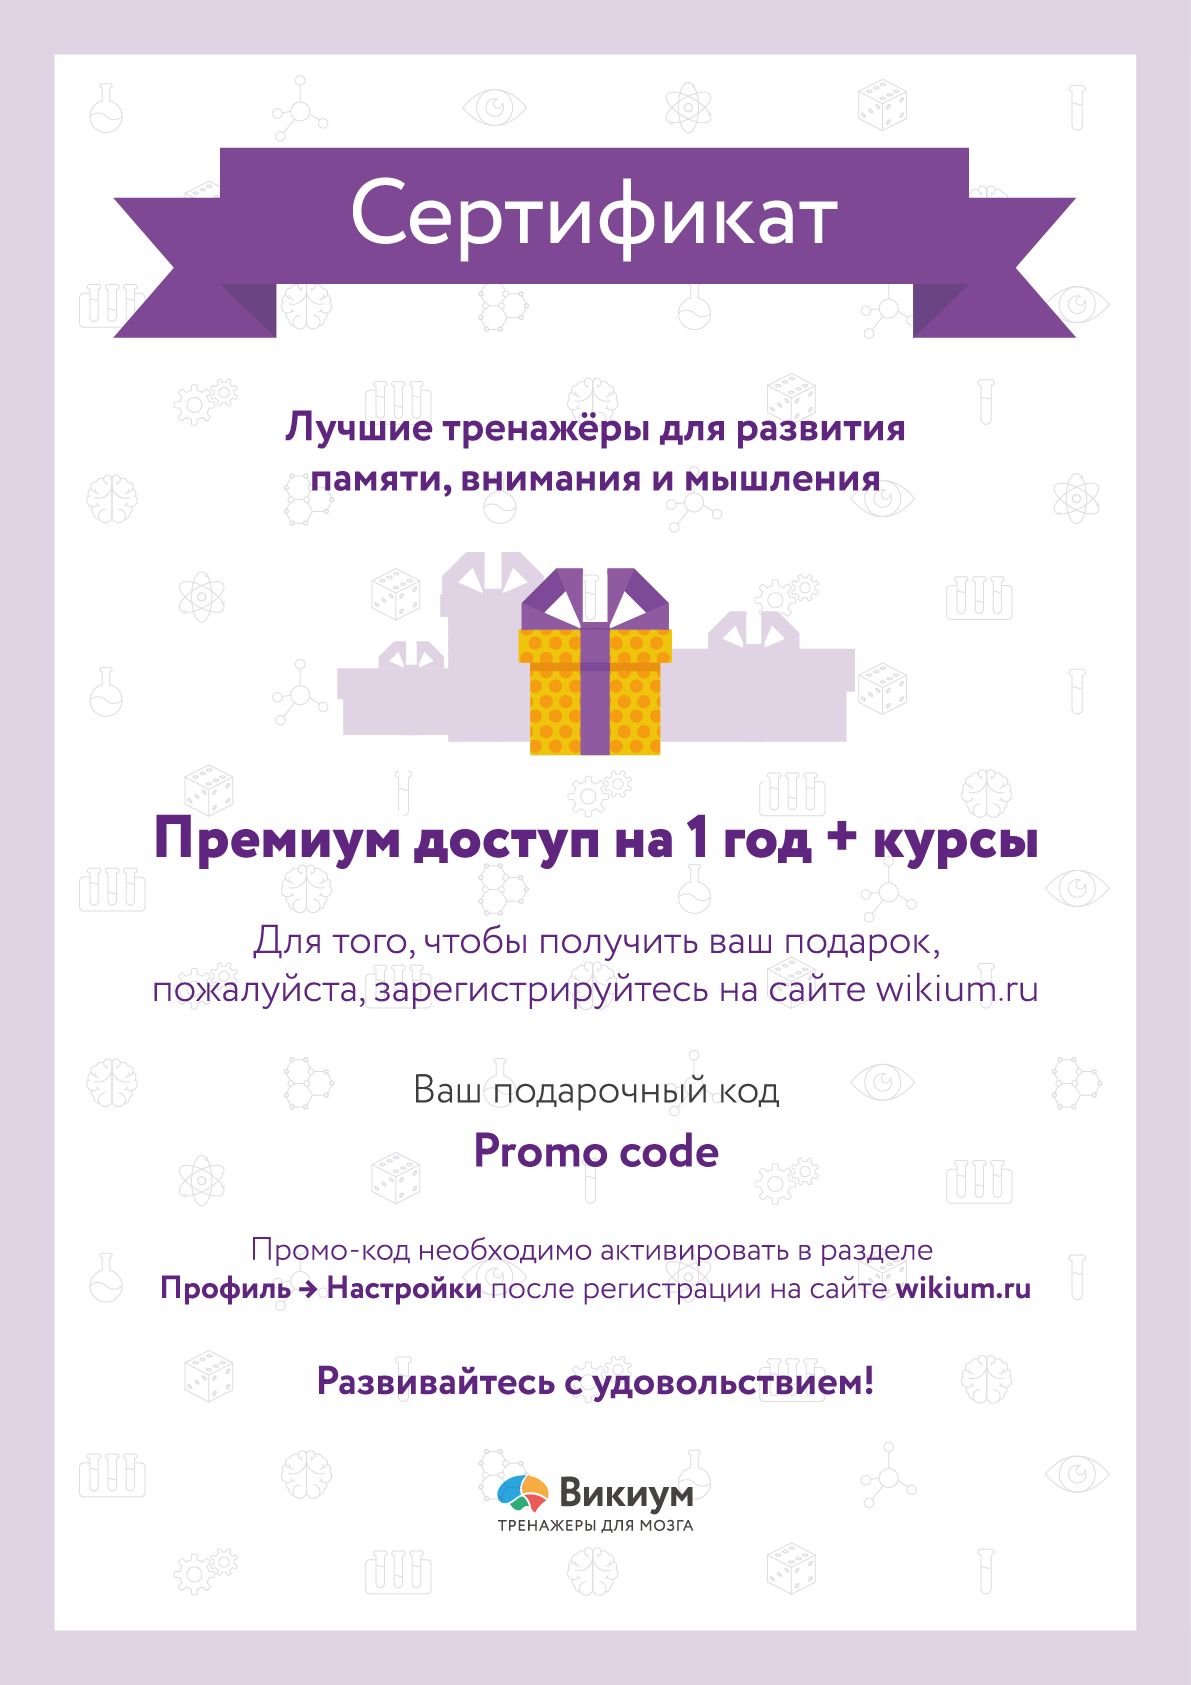 podarok_page_img